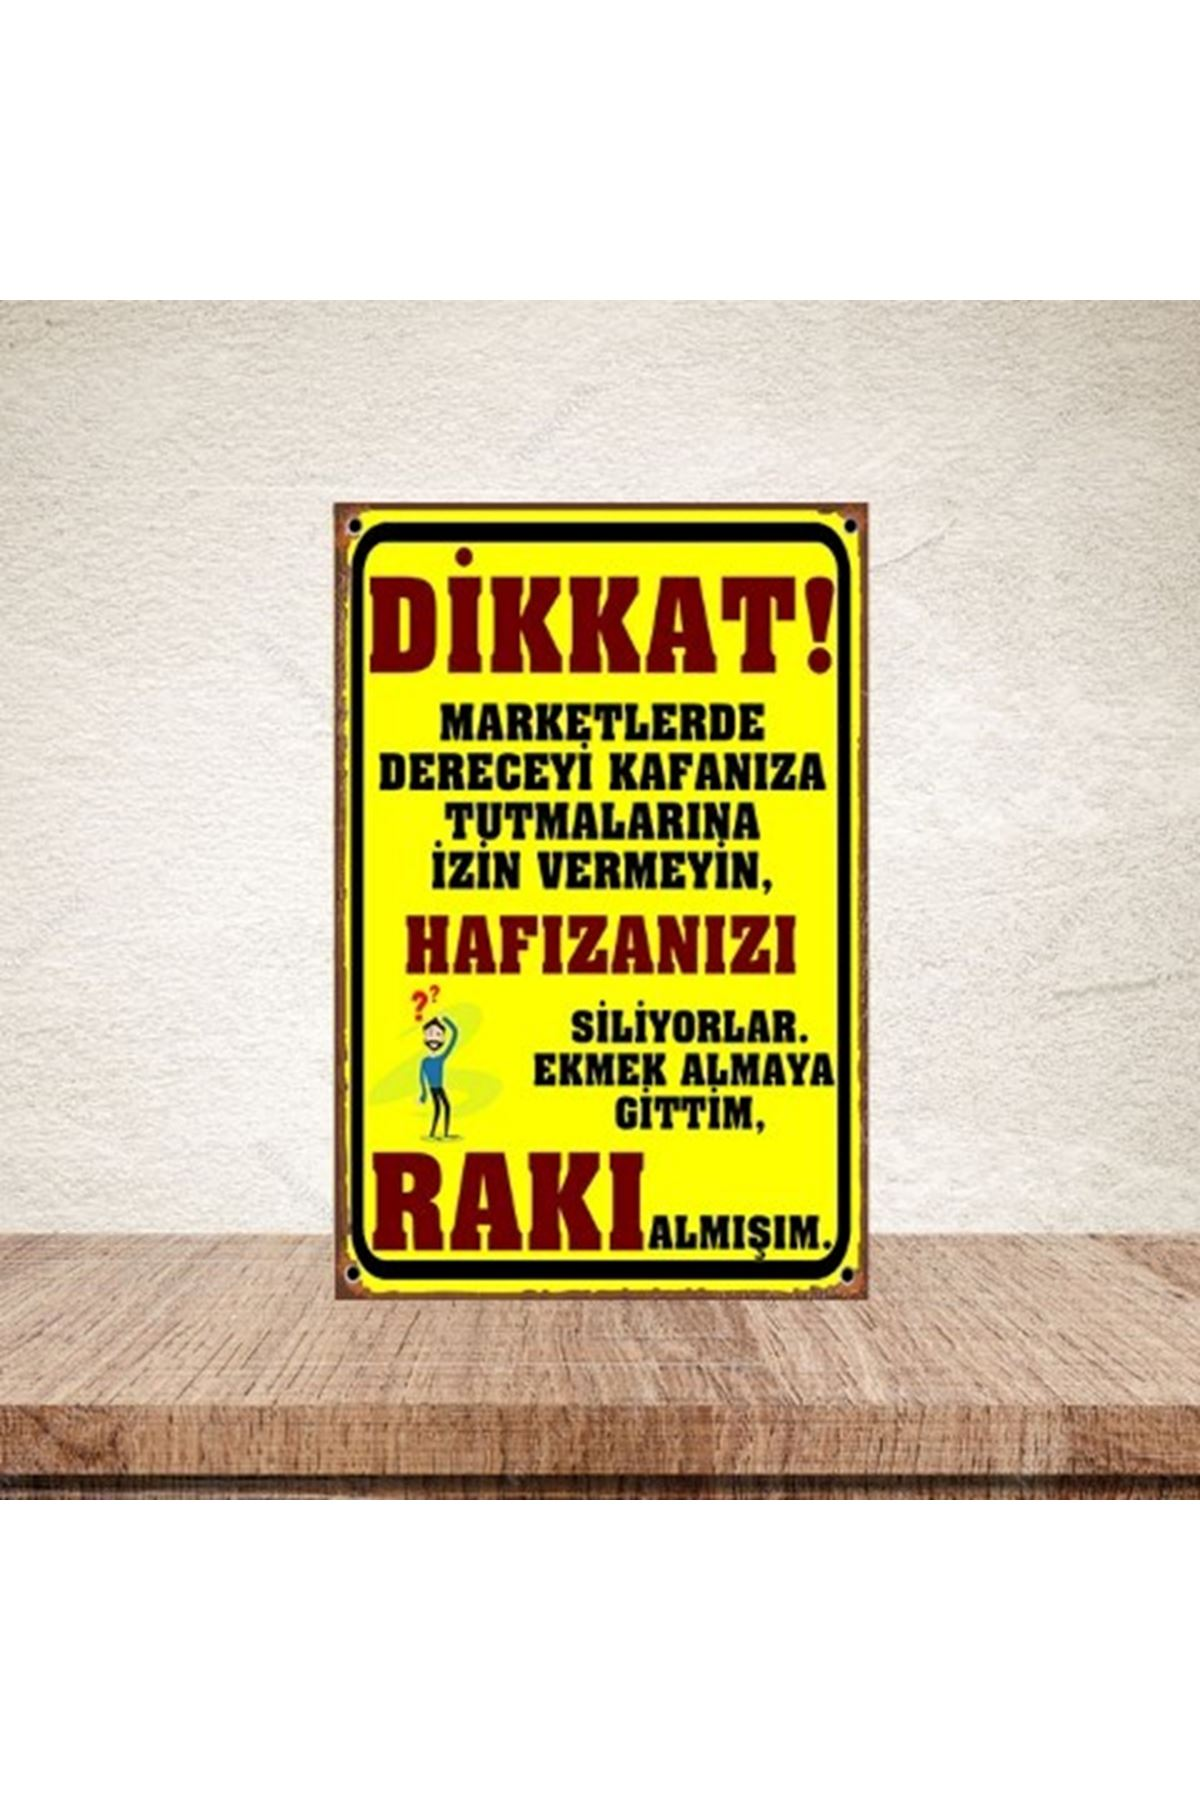 DİKKAT MARKETLERDE - AHŞAP POSTER